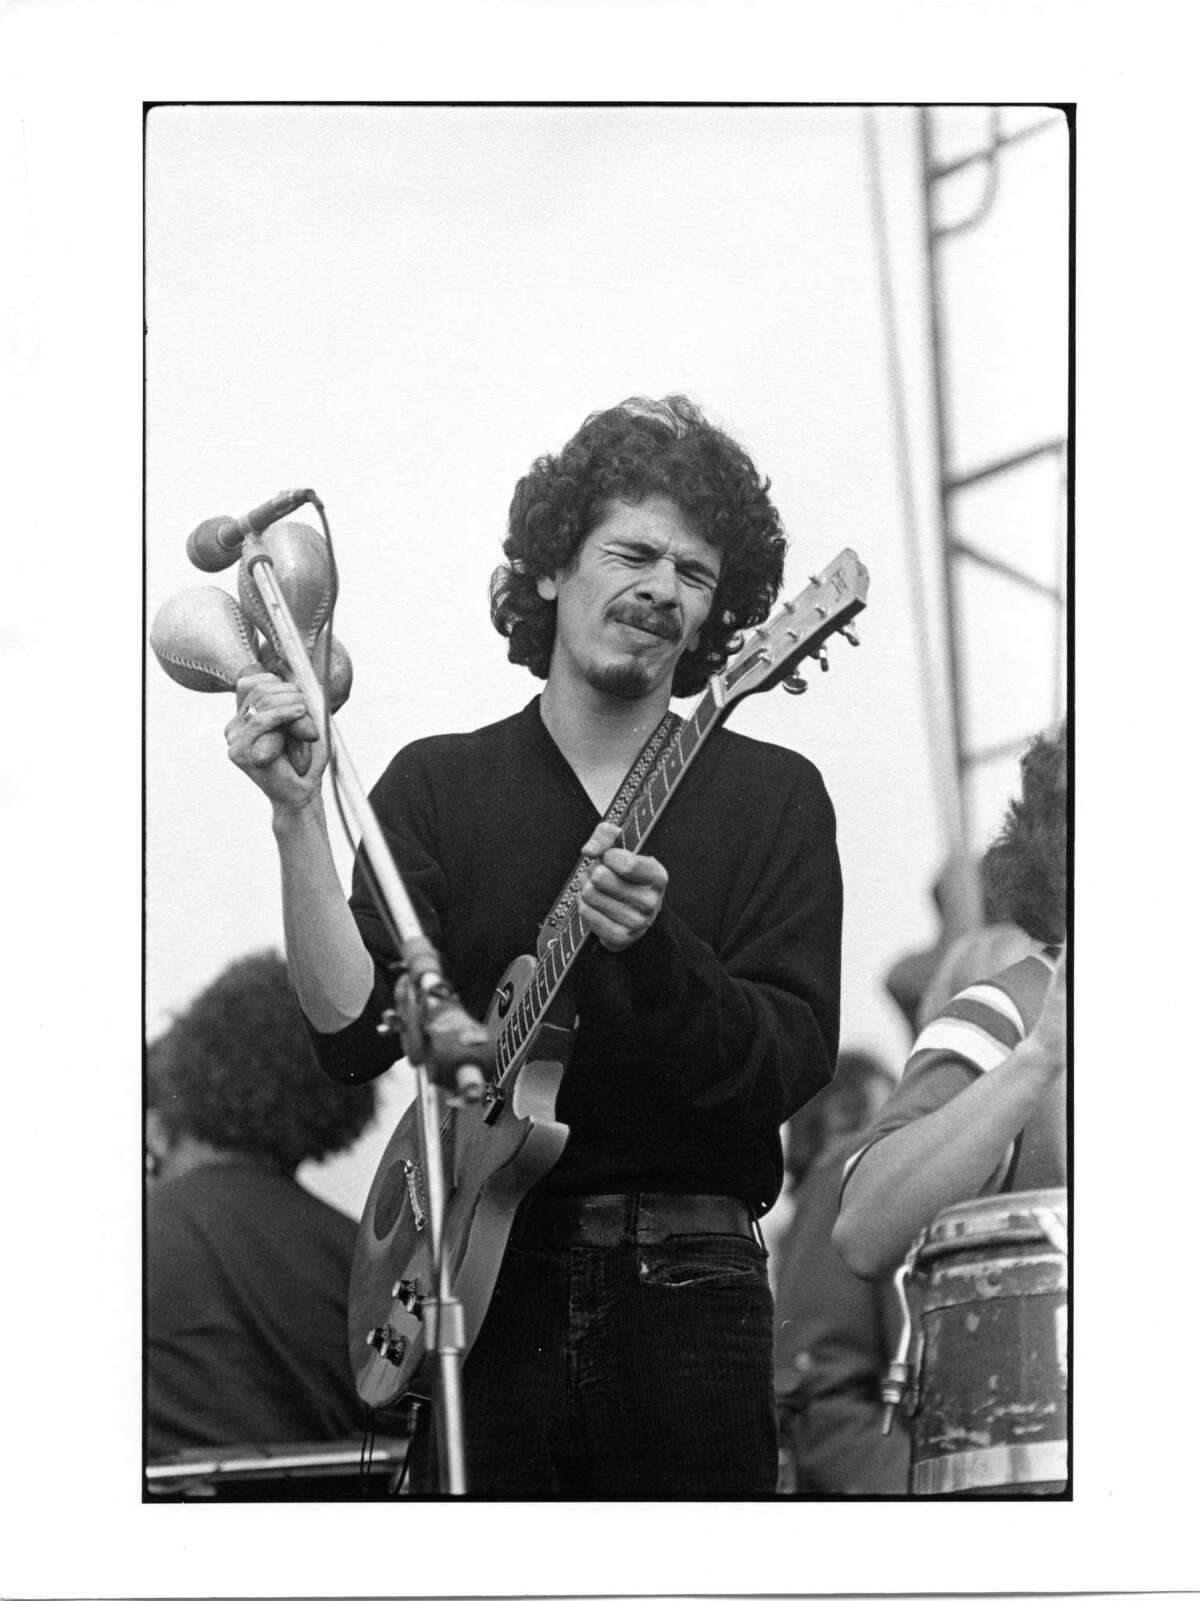 Carlos Santana at Altamont in December 1969, by Robert Altman.